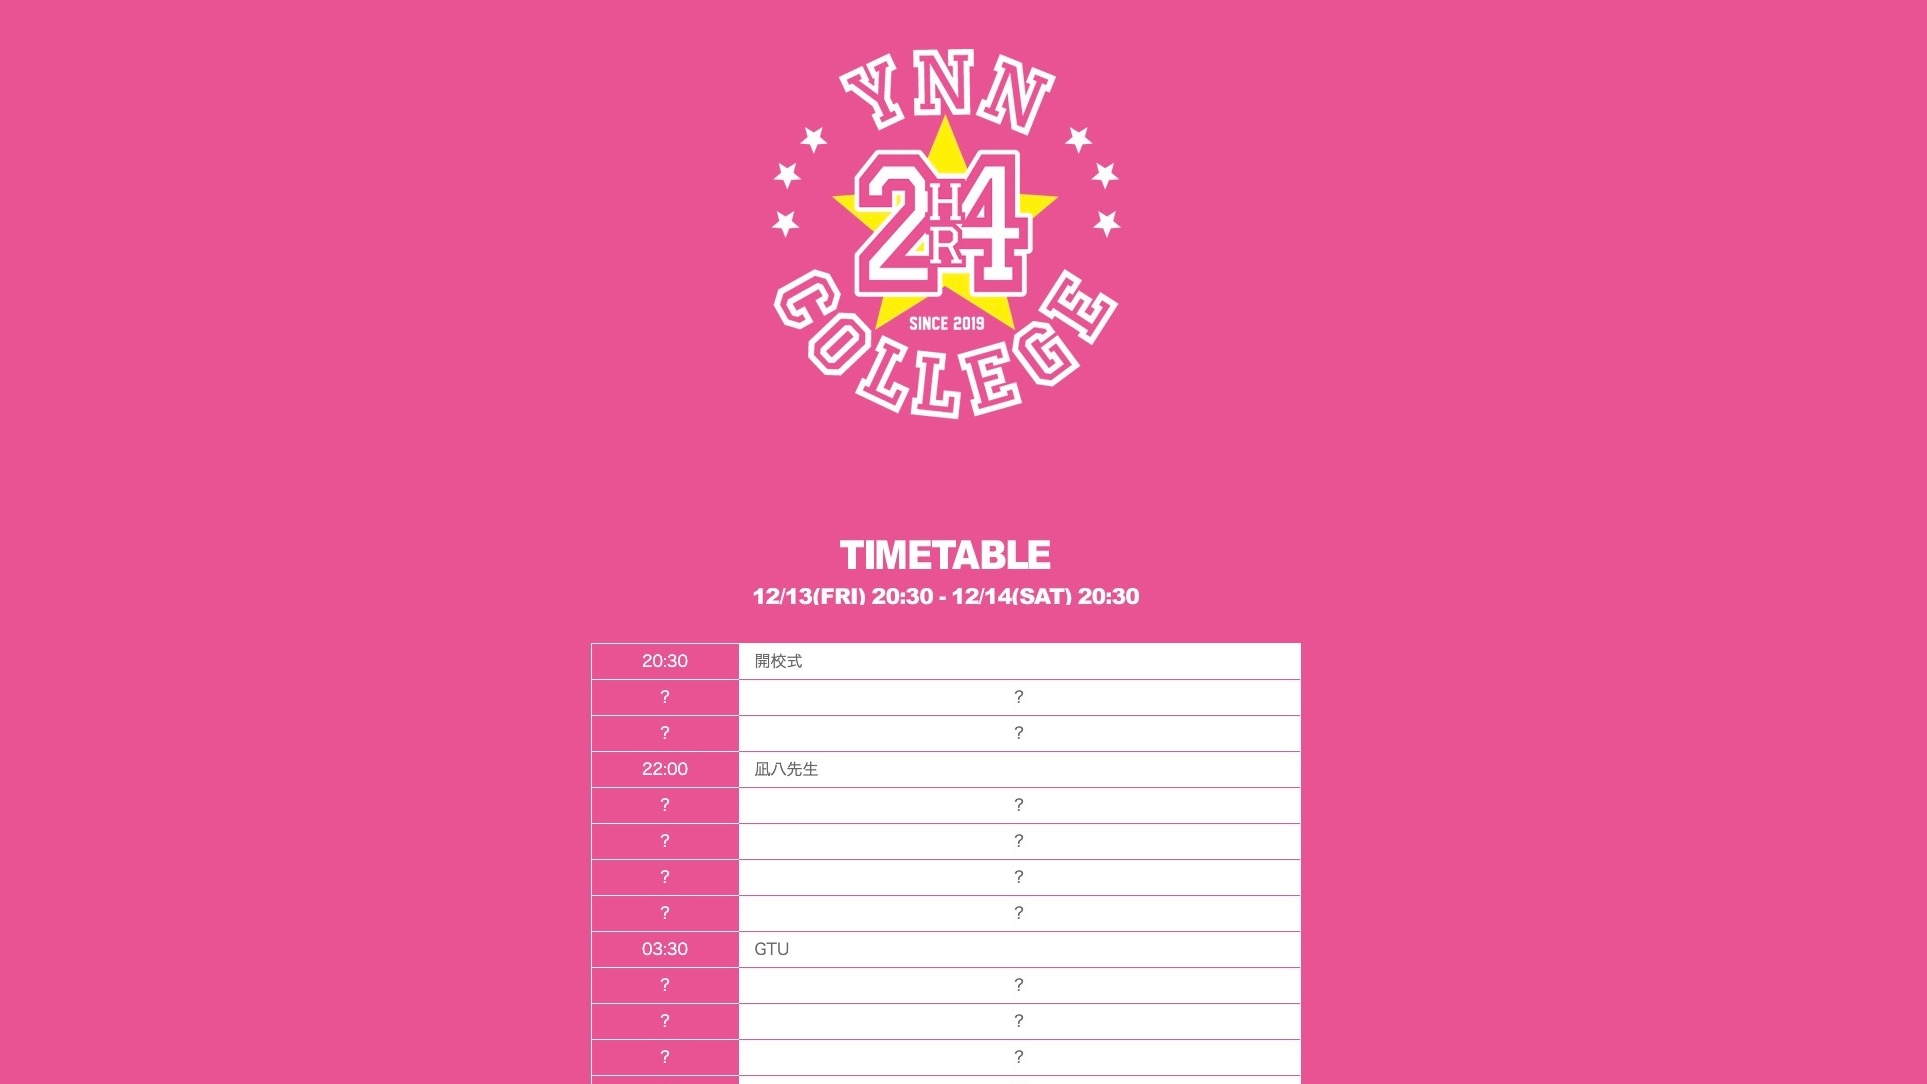 【NMB48】YNN24時間専門学校のタイムテーブルに「22:00 凪八先生」が追加